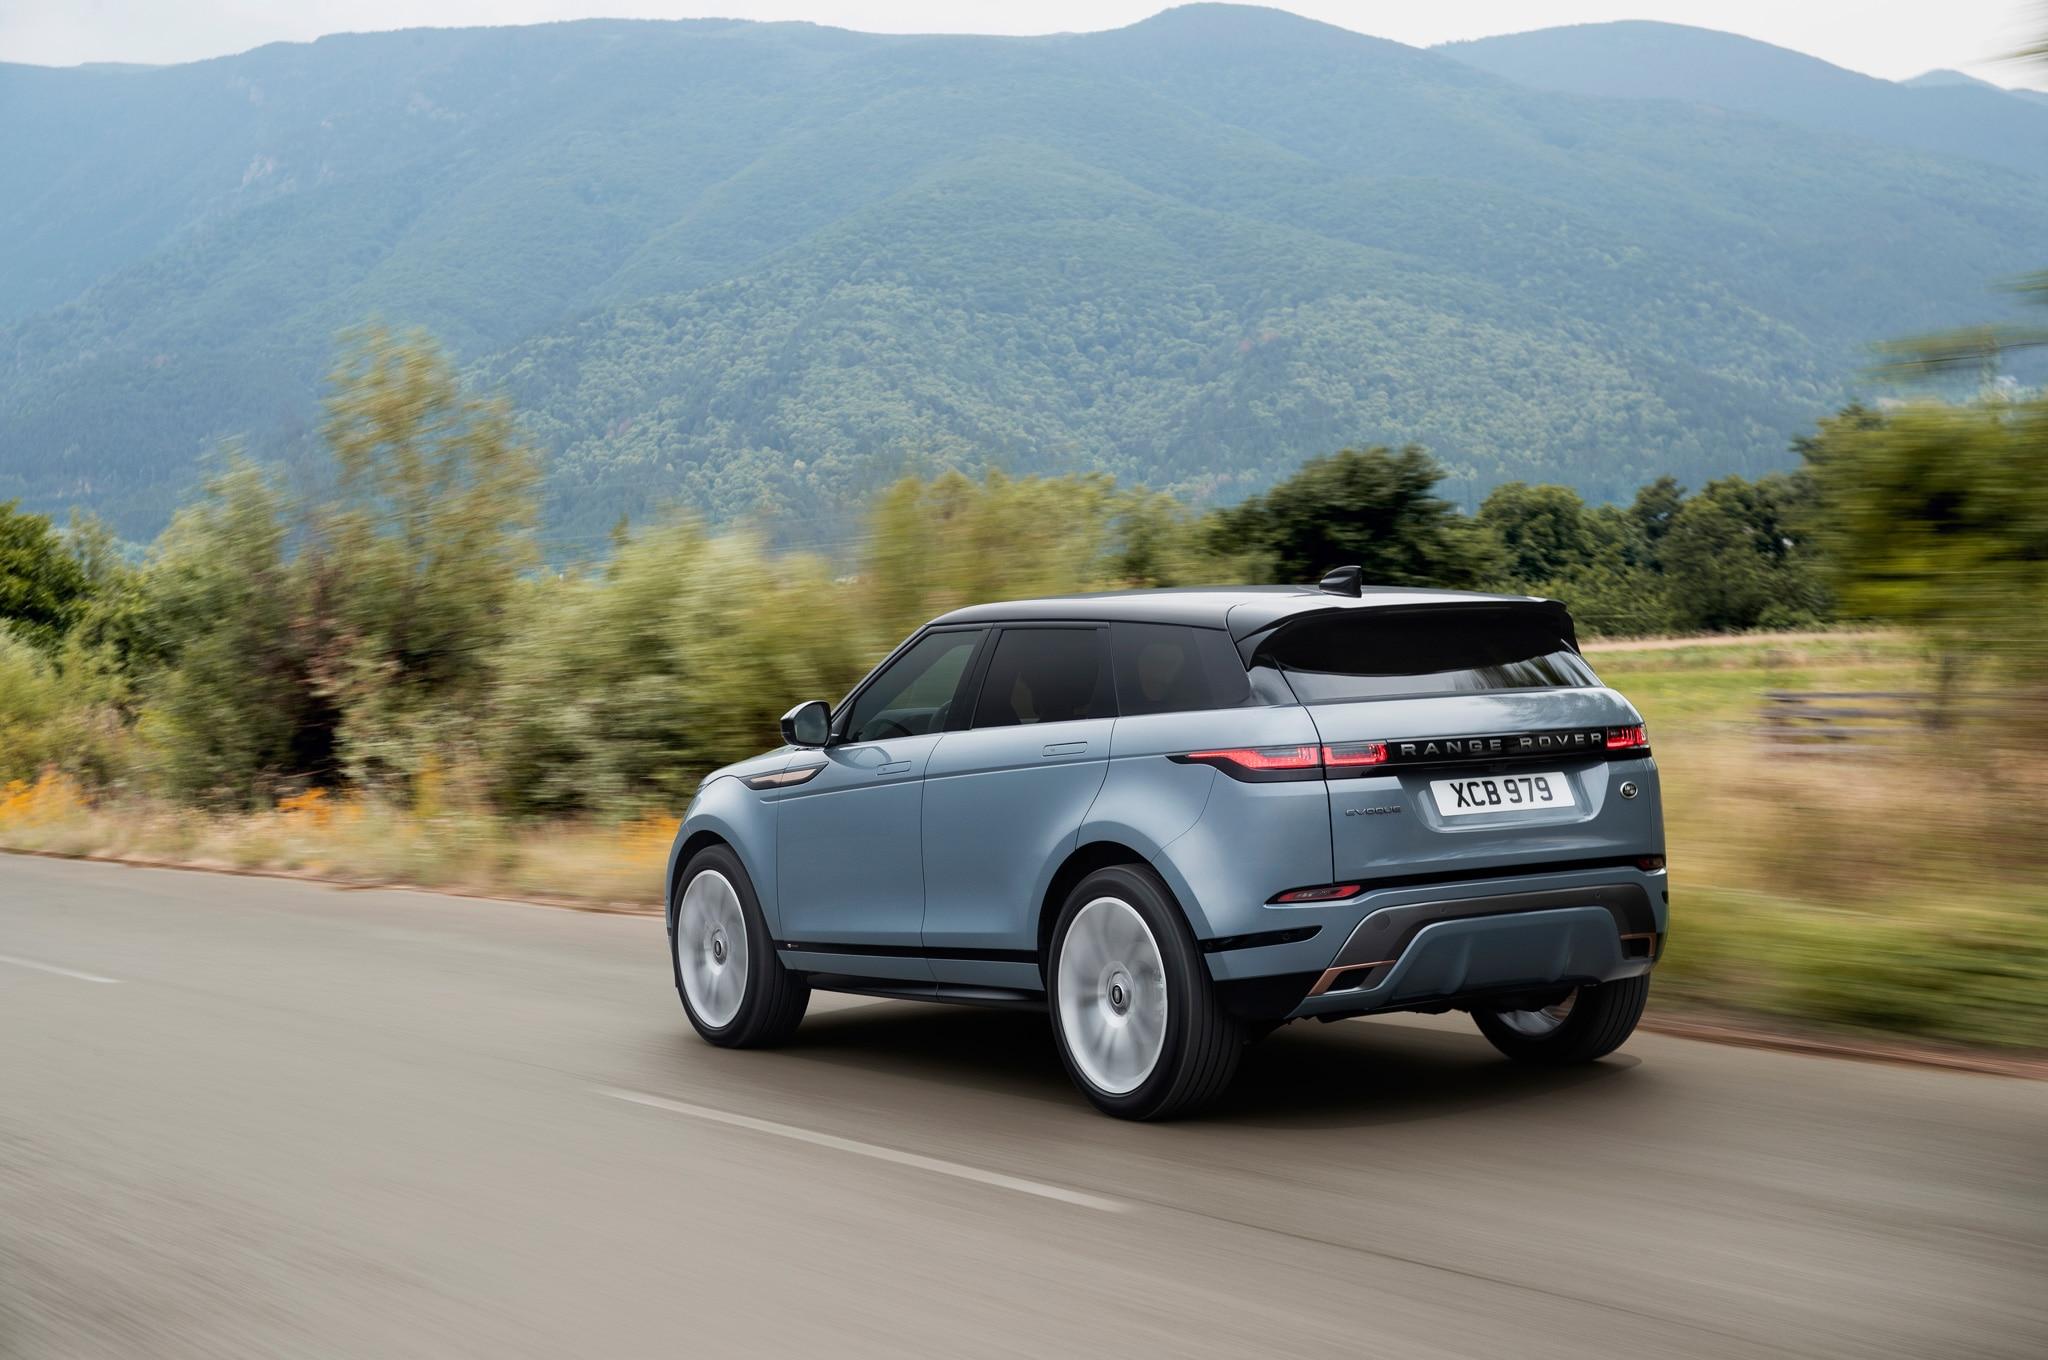 2020 range rover evoque exterior dynamic rear quarter 01